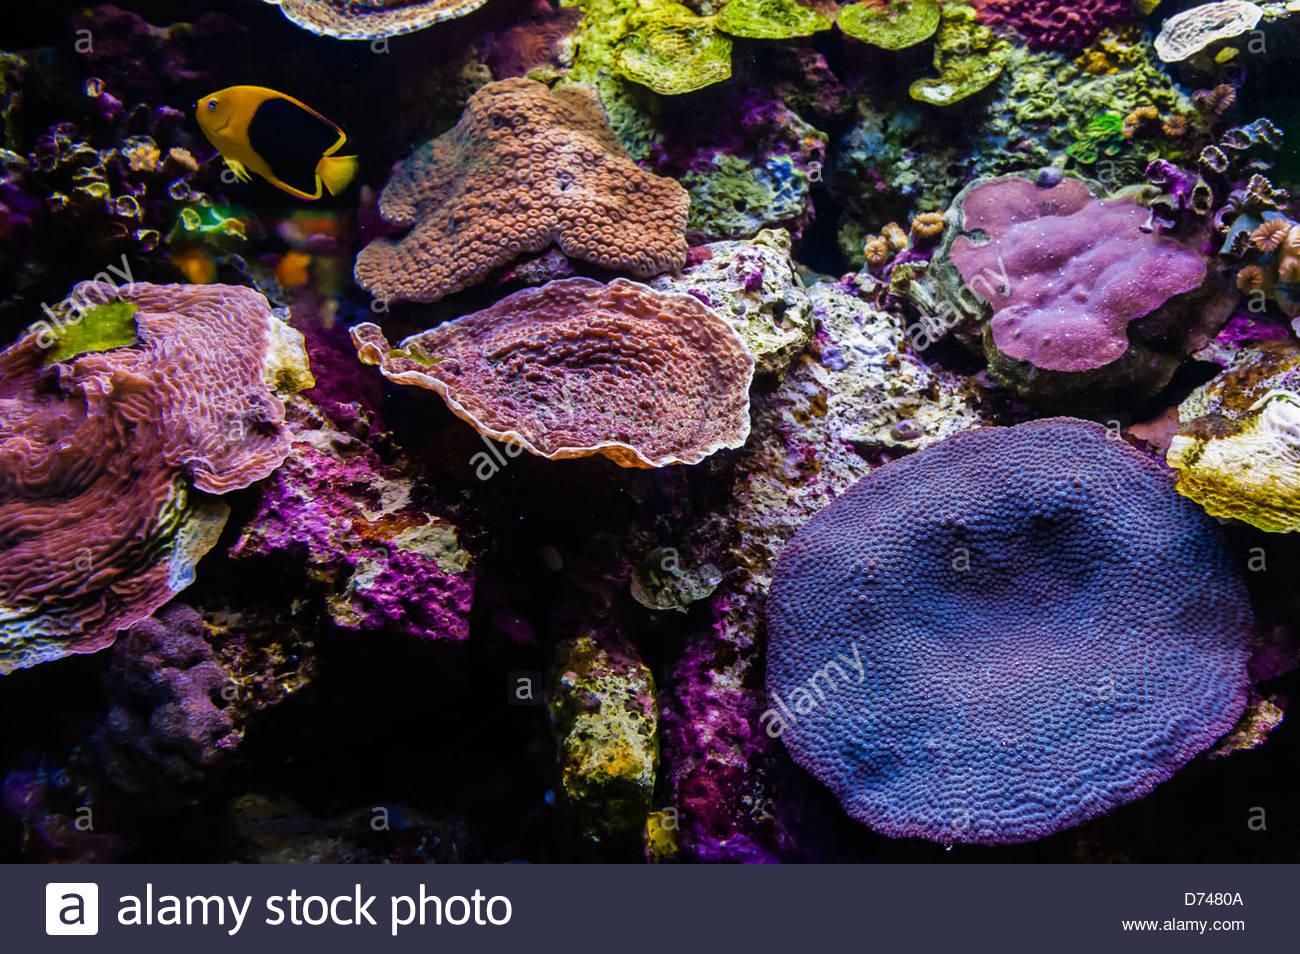 Coral Reef Aquarium, Xcaret Park (Eco-archaeological Theme park), Riviera Maya, Quintana Roo, Mexico - Stock Image